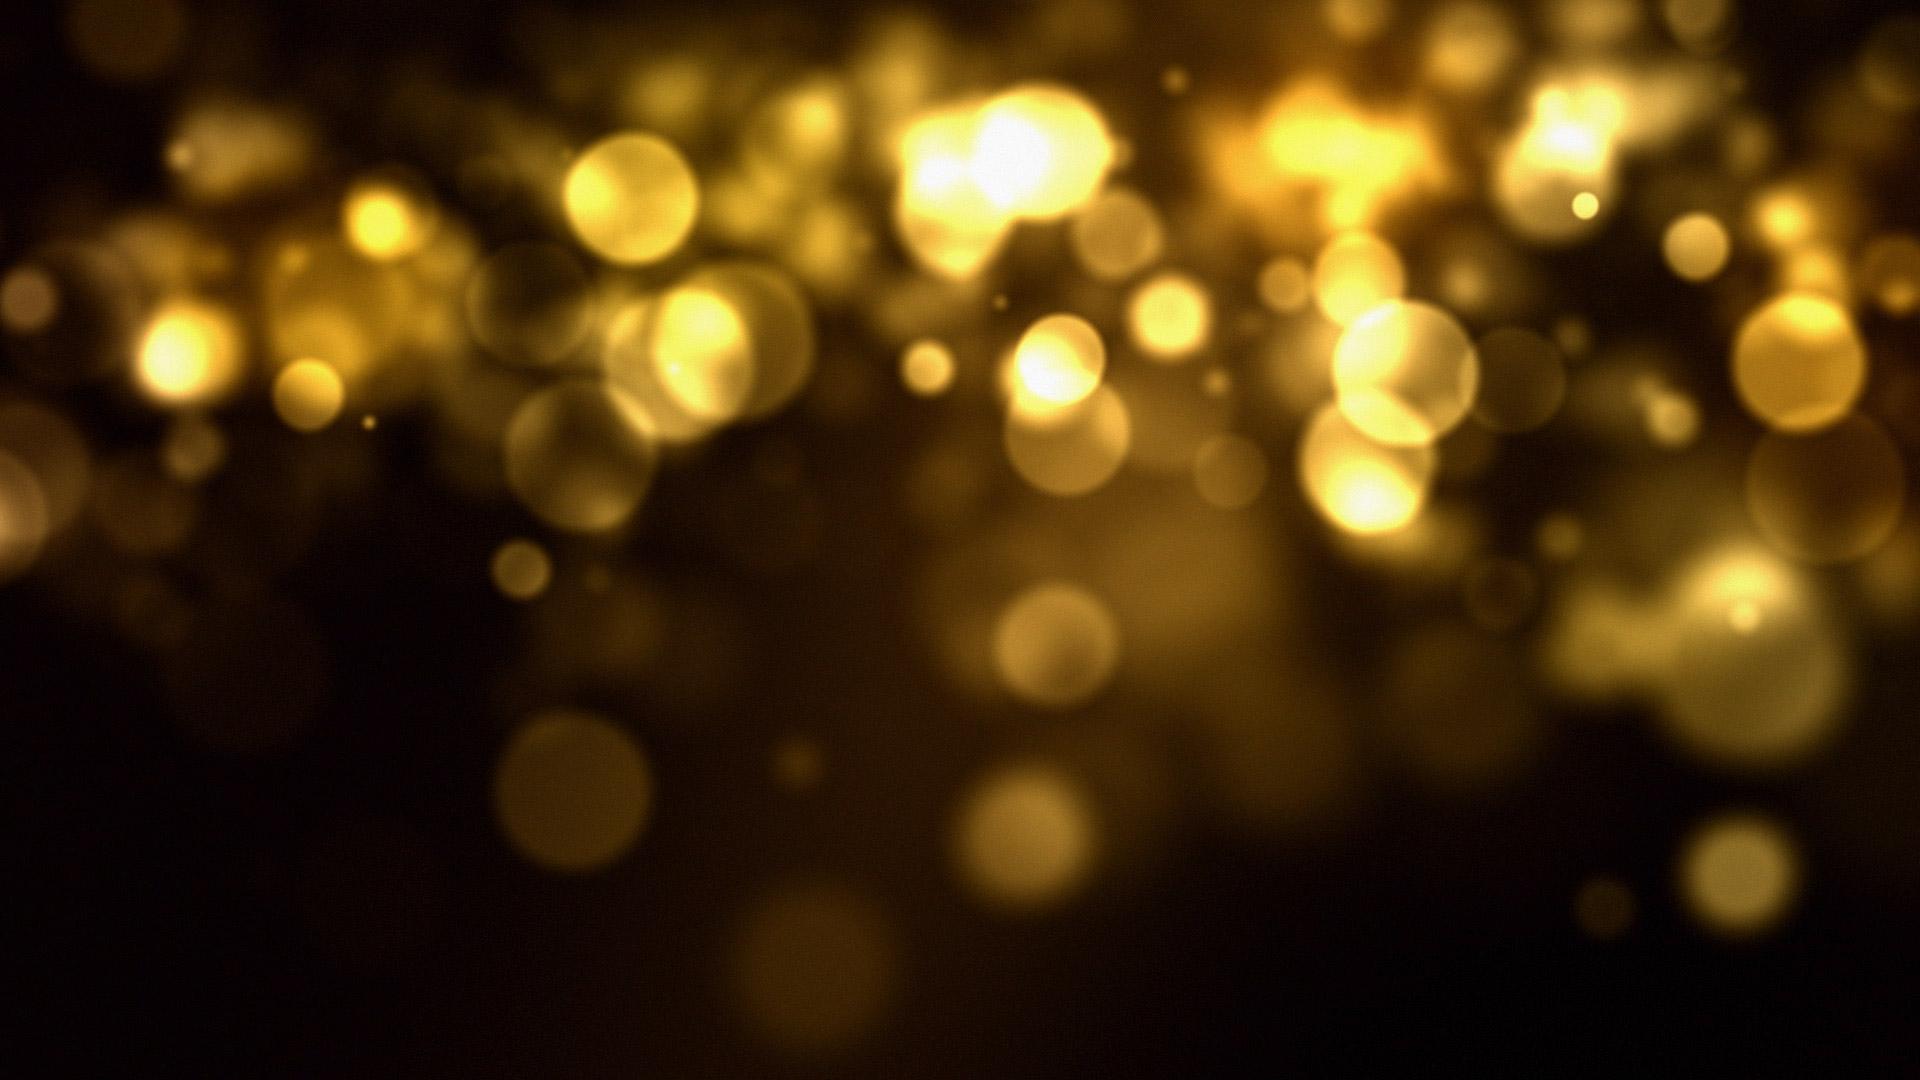 0296-falling-glitter-loop-golden-0-00-00-00.jpg